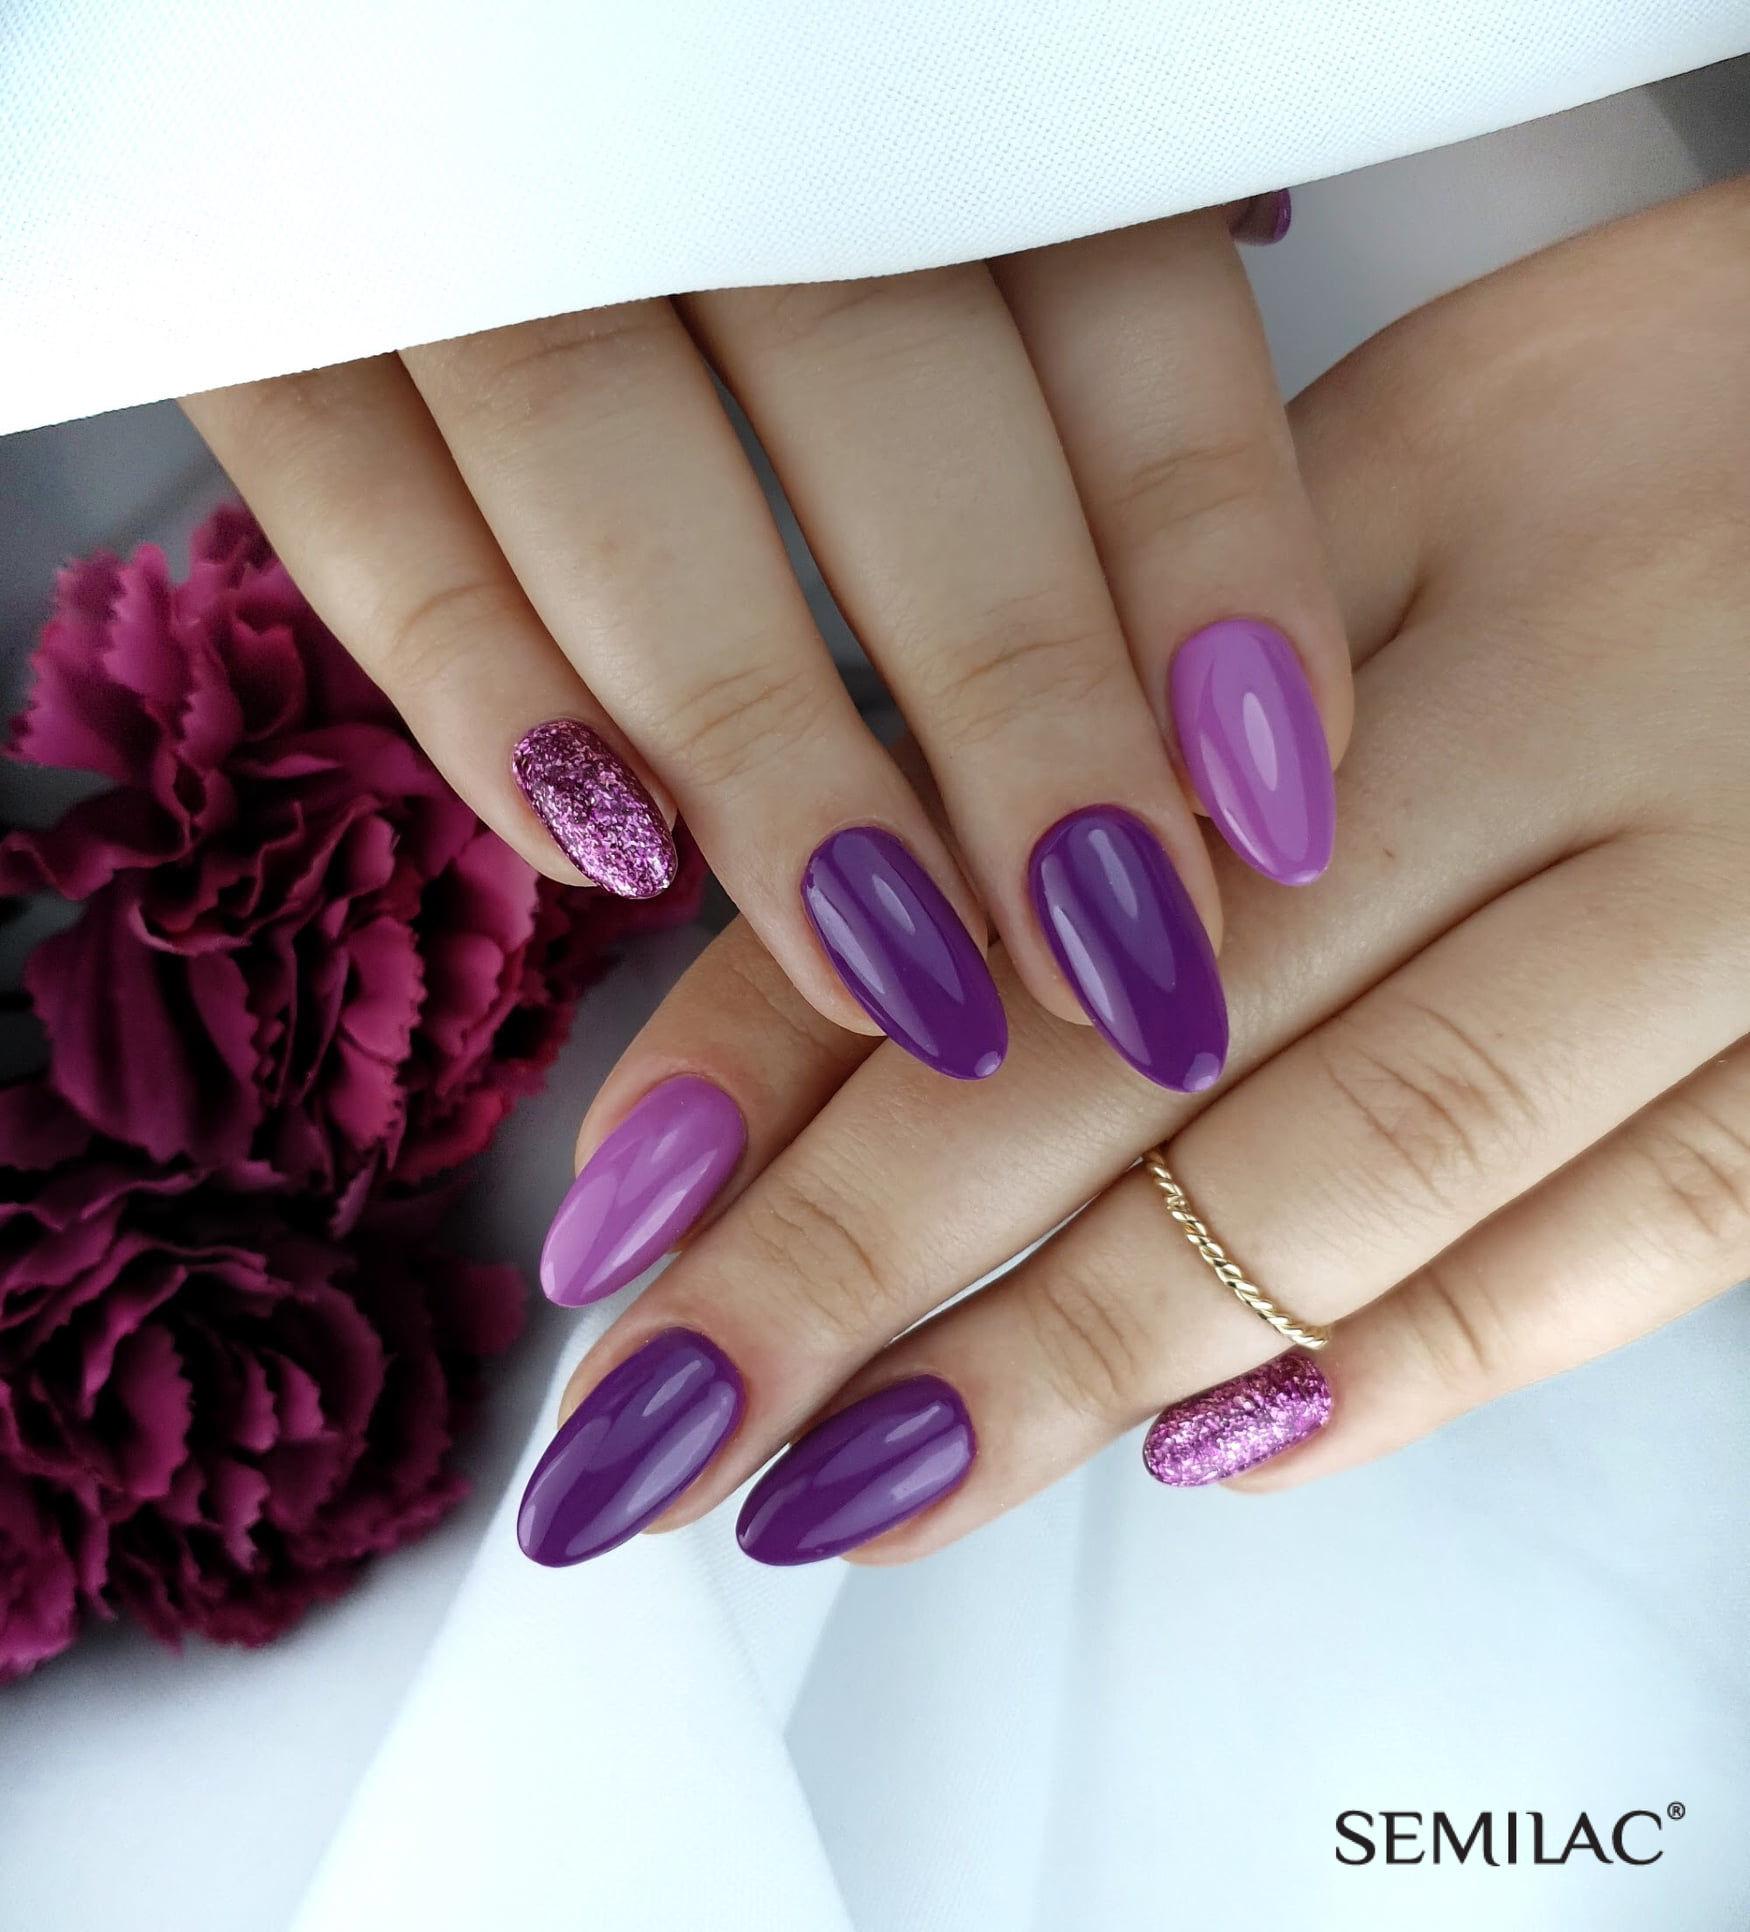 SEMILAC 010 Pink & Violet UV LED Lakier Hybrydowy 7ml